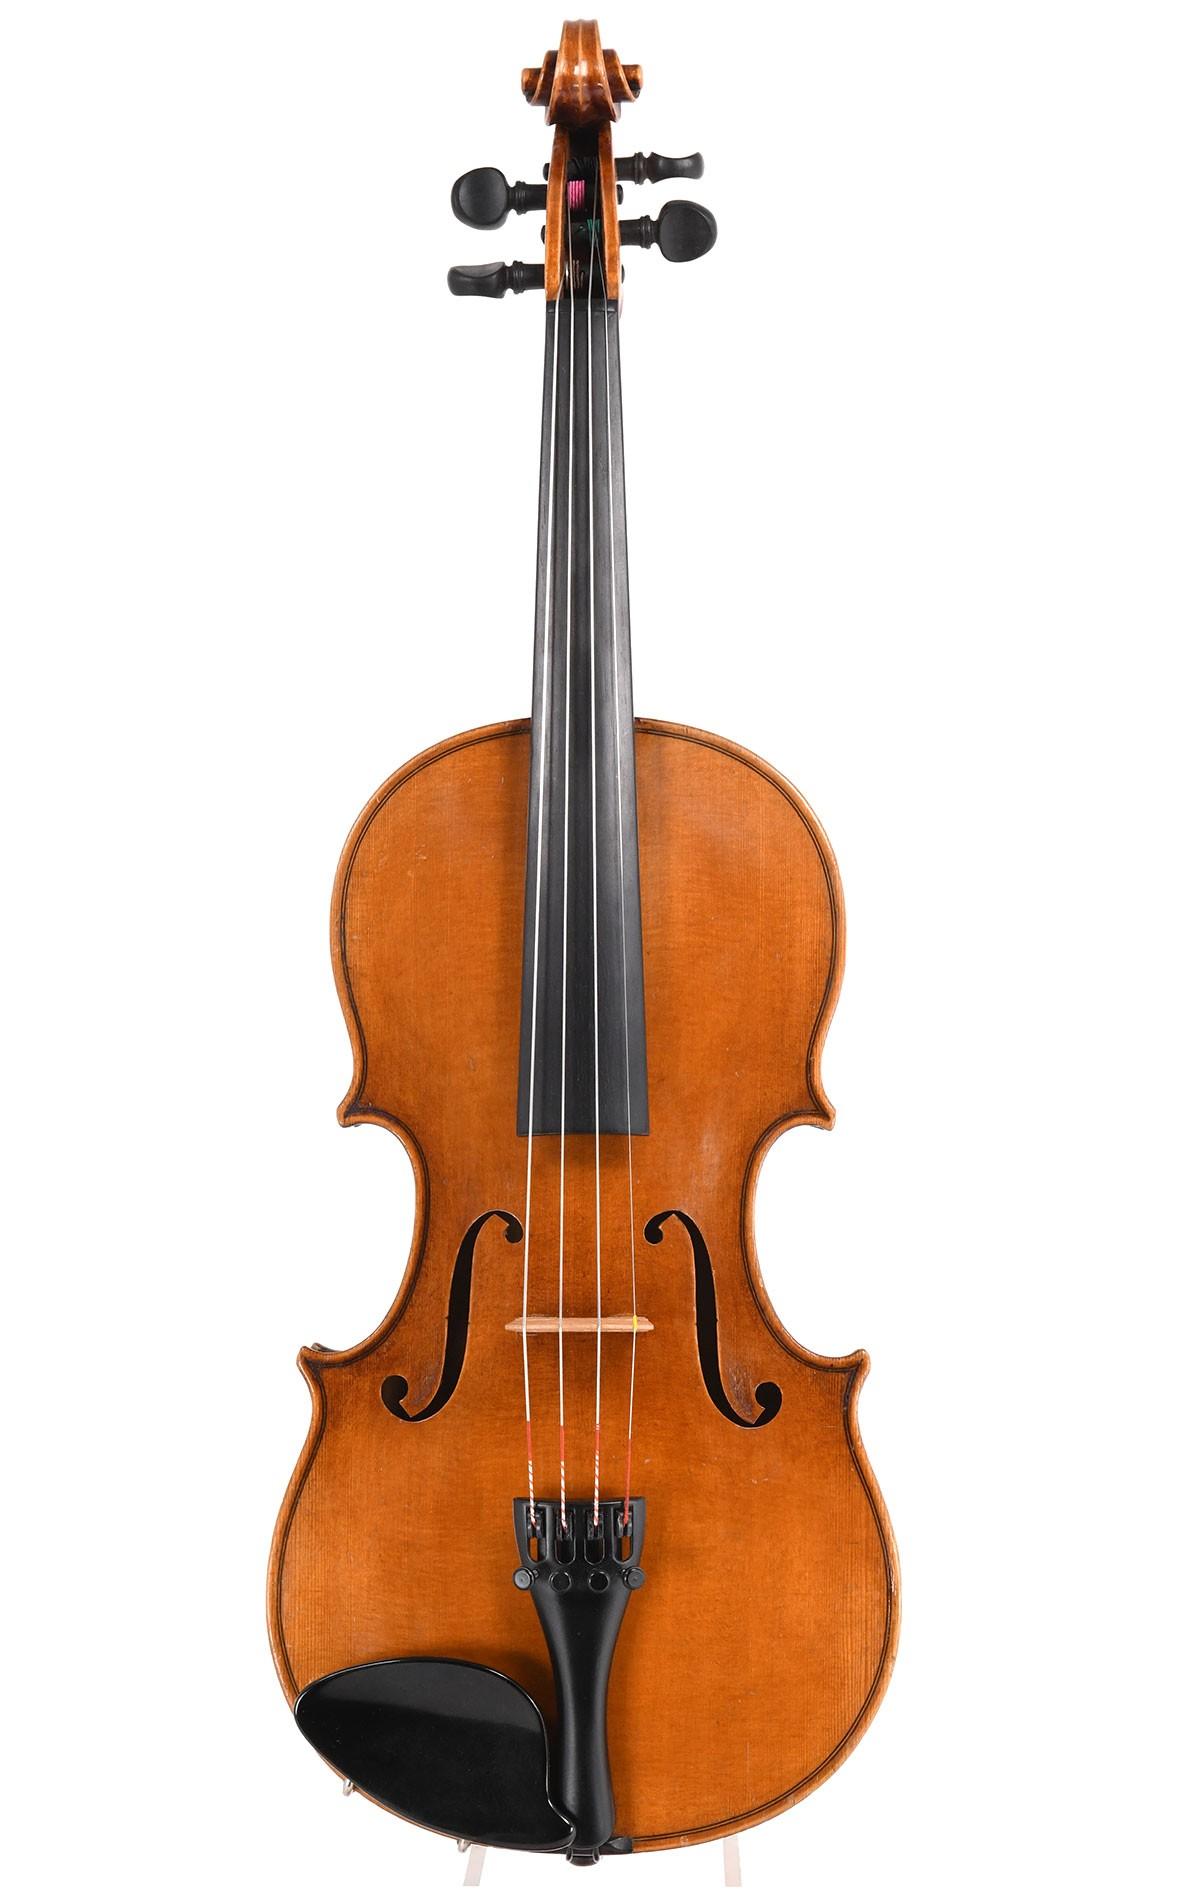 Ladies' violin, 7/8 violin - top